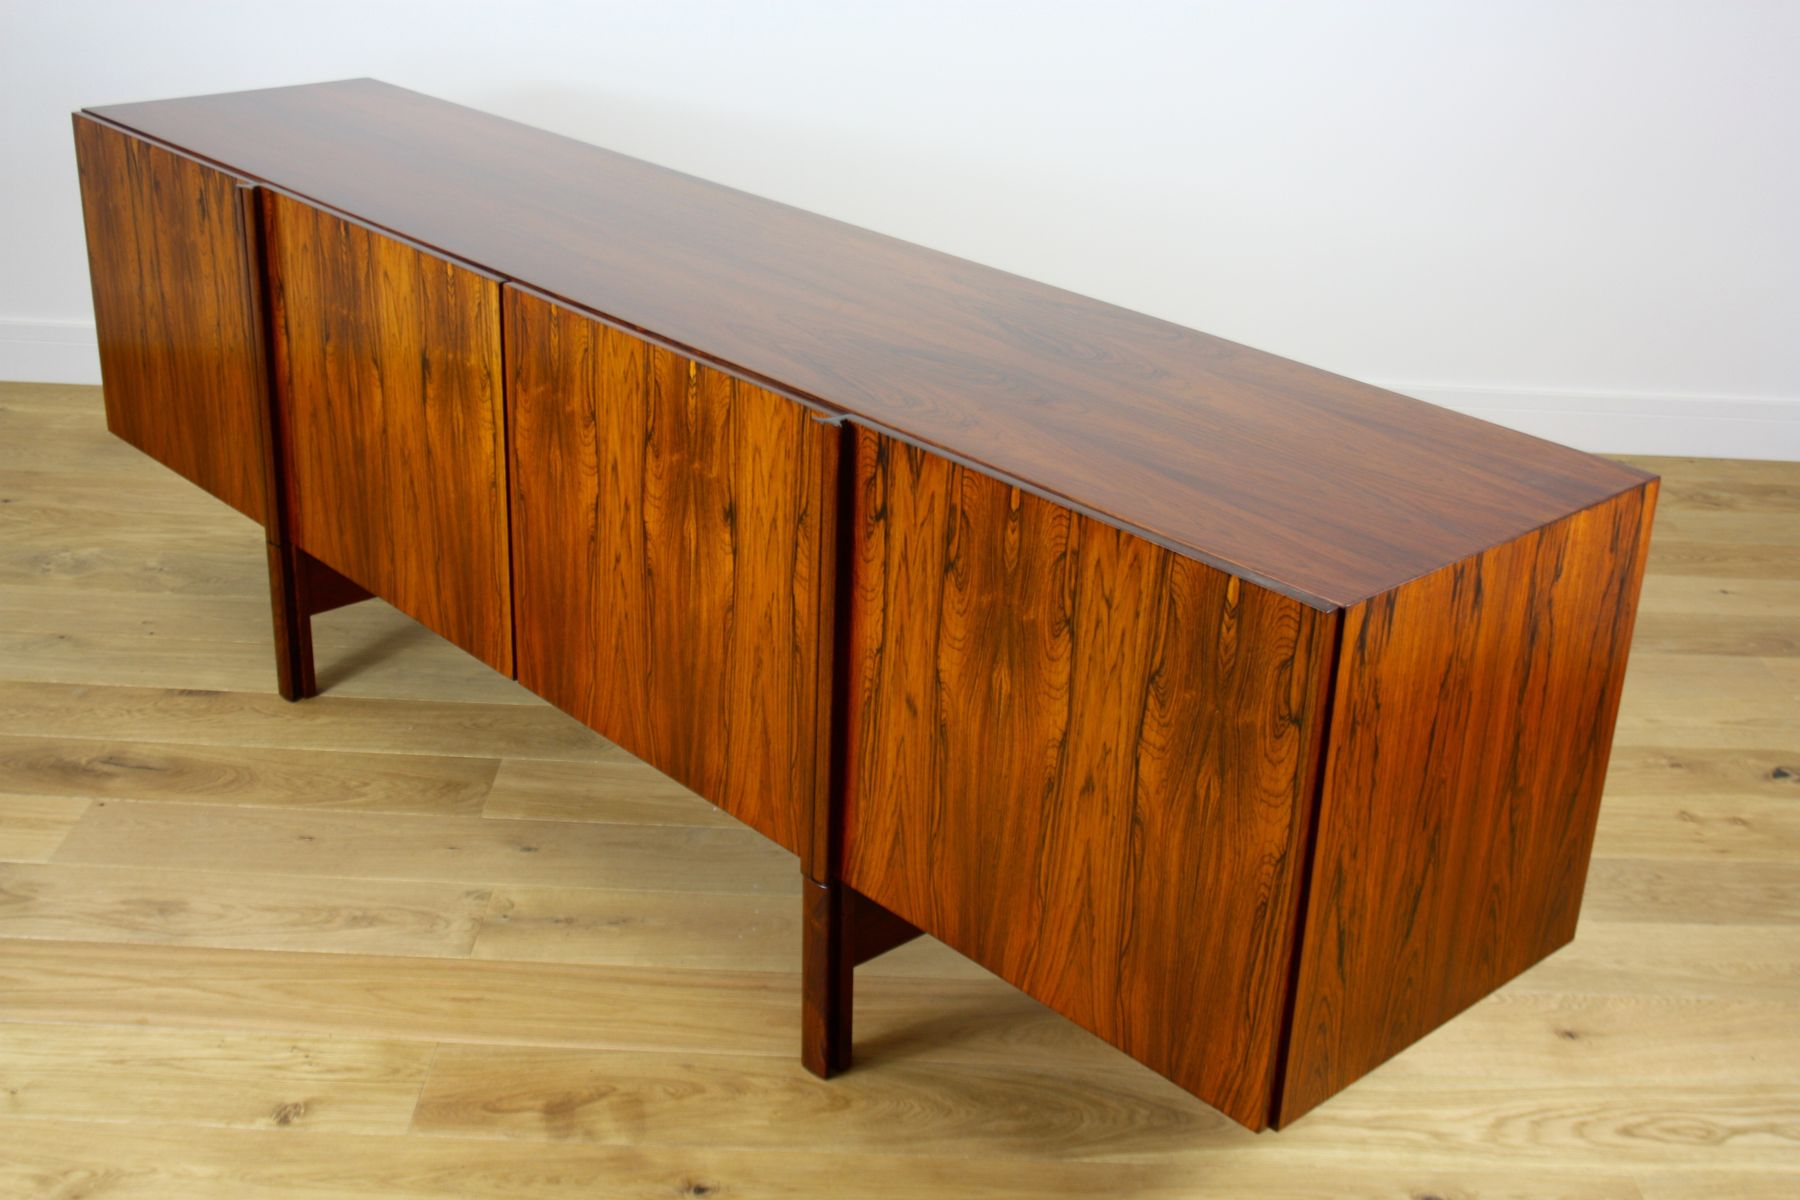 langes sideboard aus palisander von ib kofod larsen f r. Black Bedroom Furniture Sets. Home Design Ideas